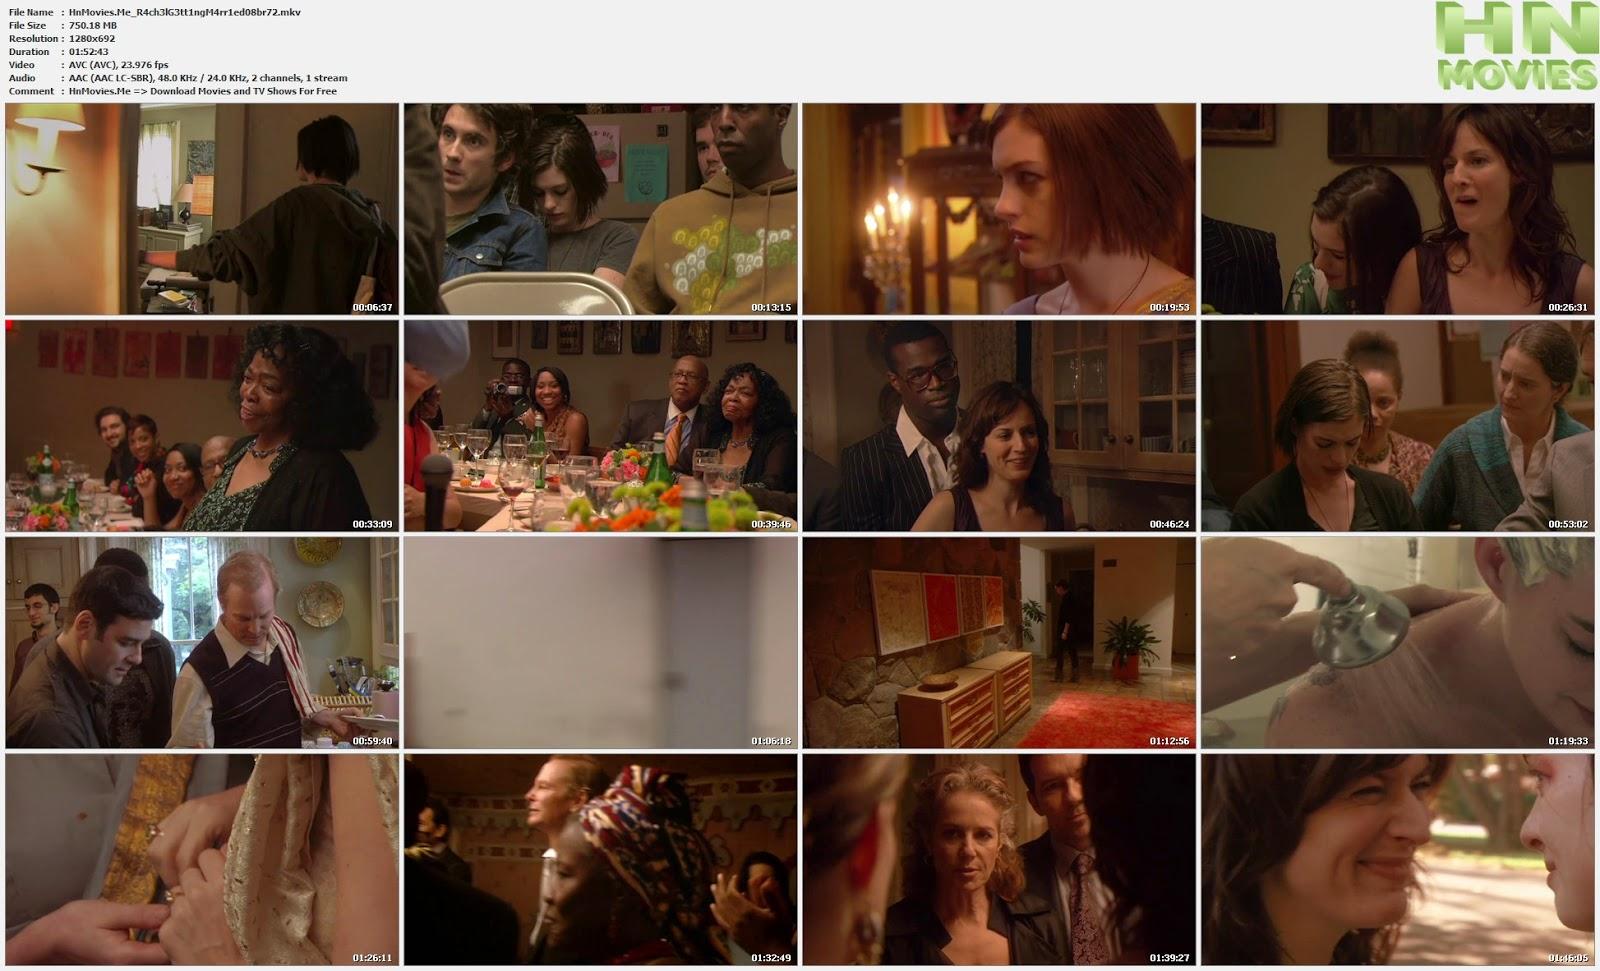 movie screenshot of Rachel Getting Married fdmovie.com